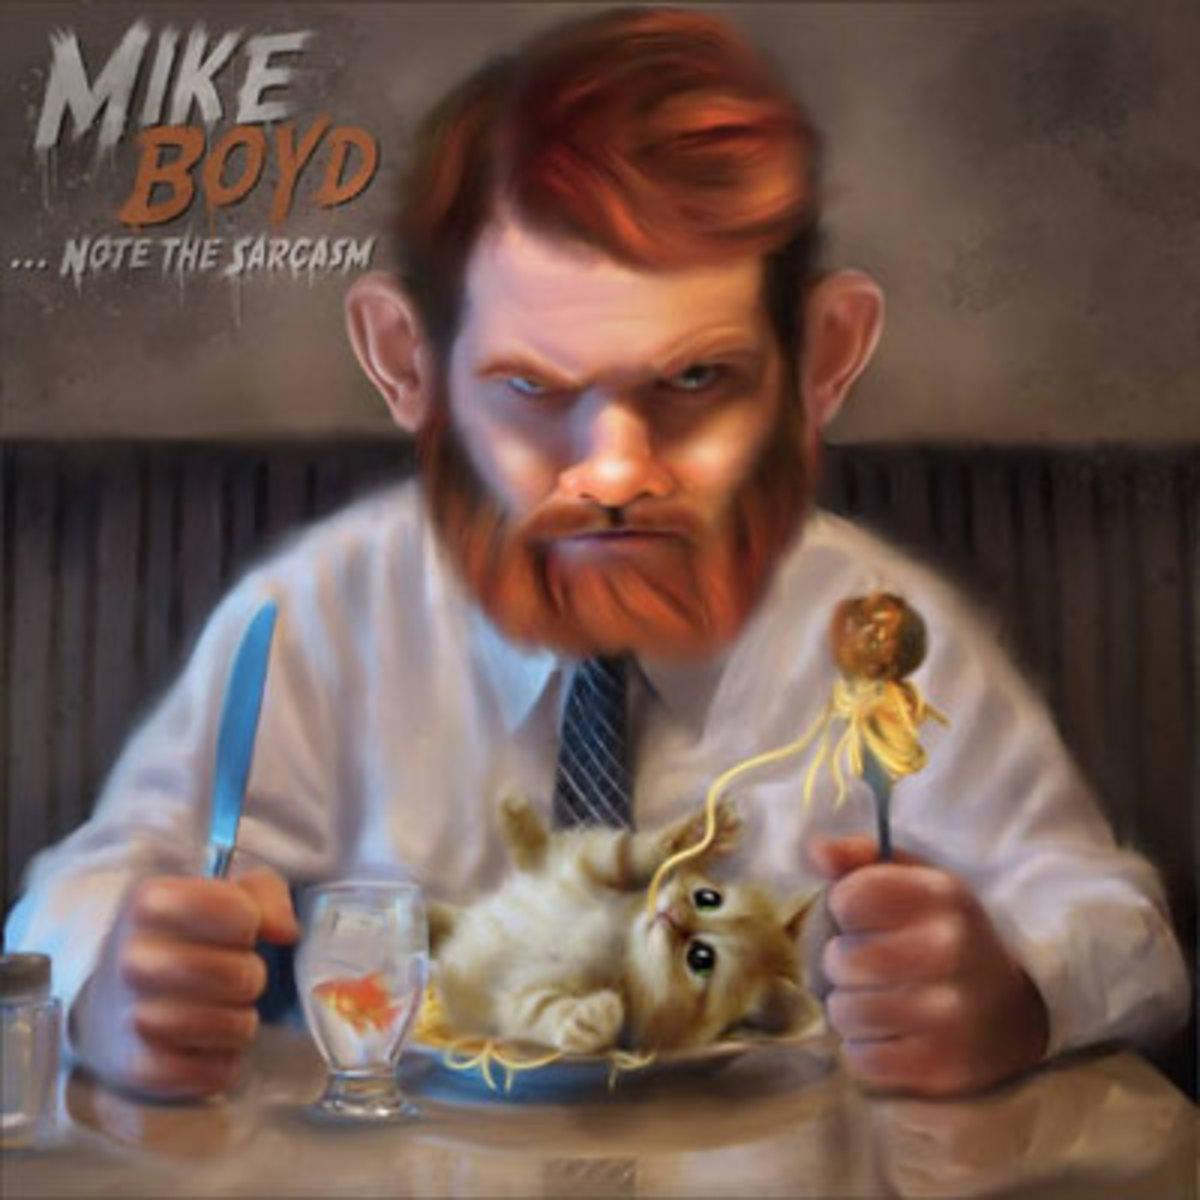 mikeboyd-notethesarcasm.jpg